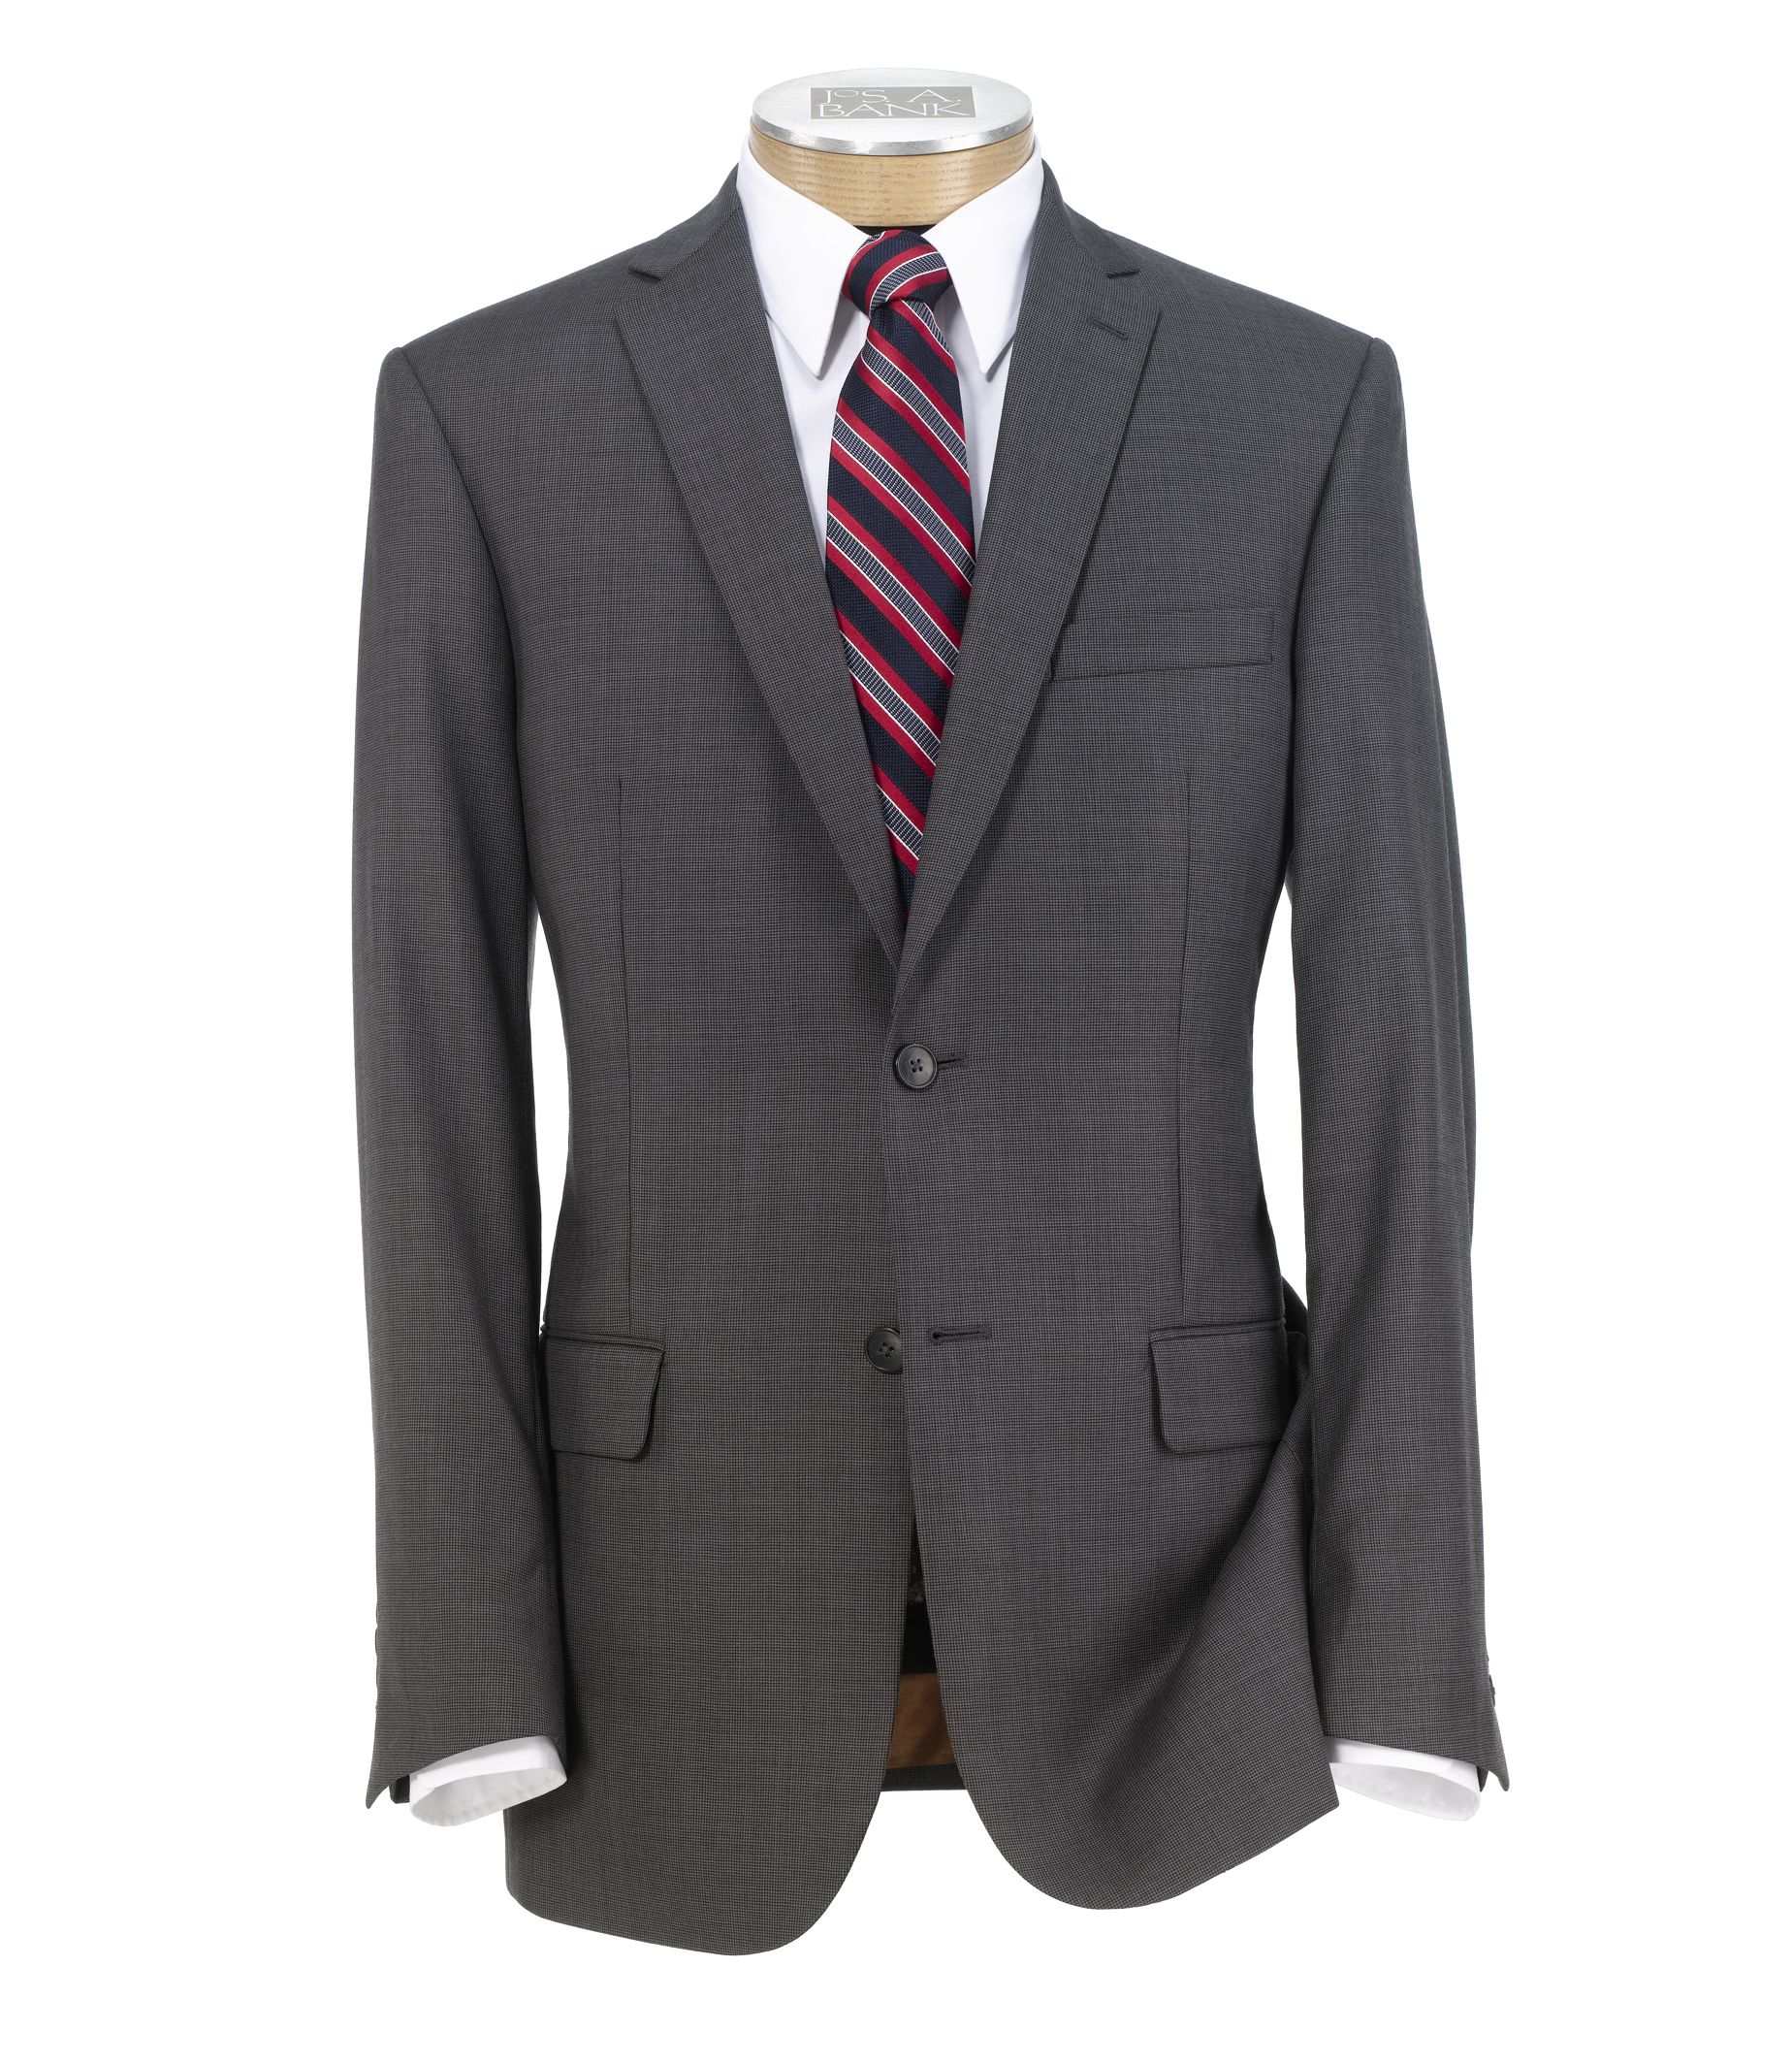 Joseph Slim Fit 2 Button Plain Front Wool Suit - Extended Sizes- Grey Mini HoundStoot